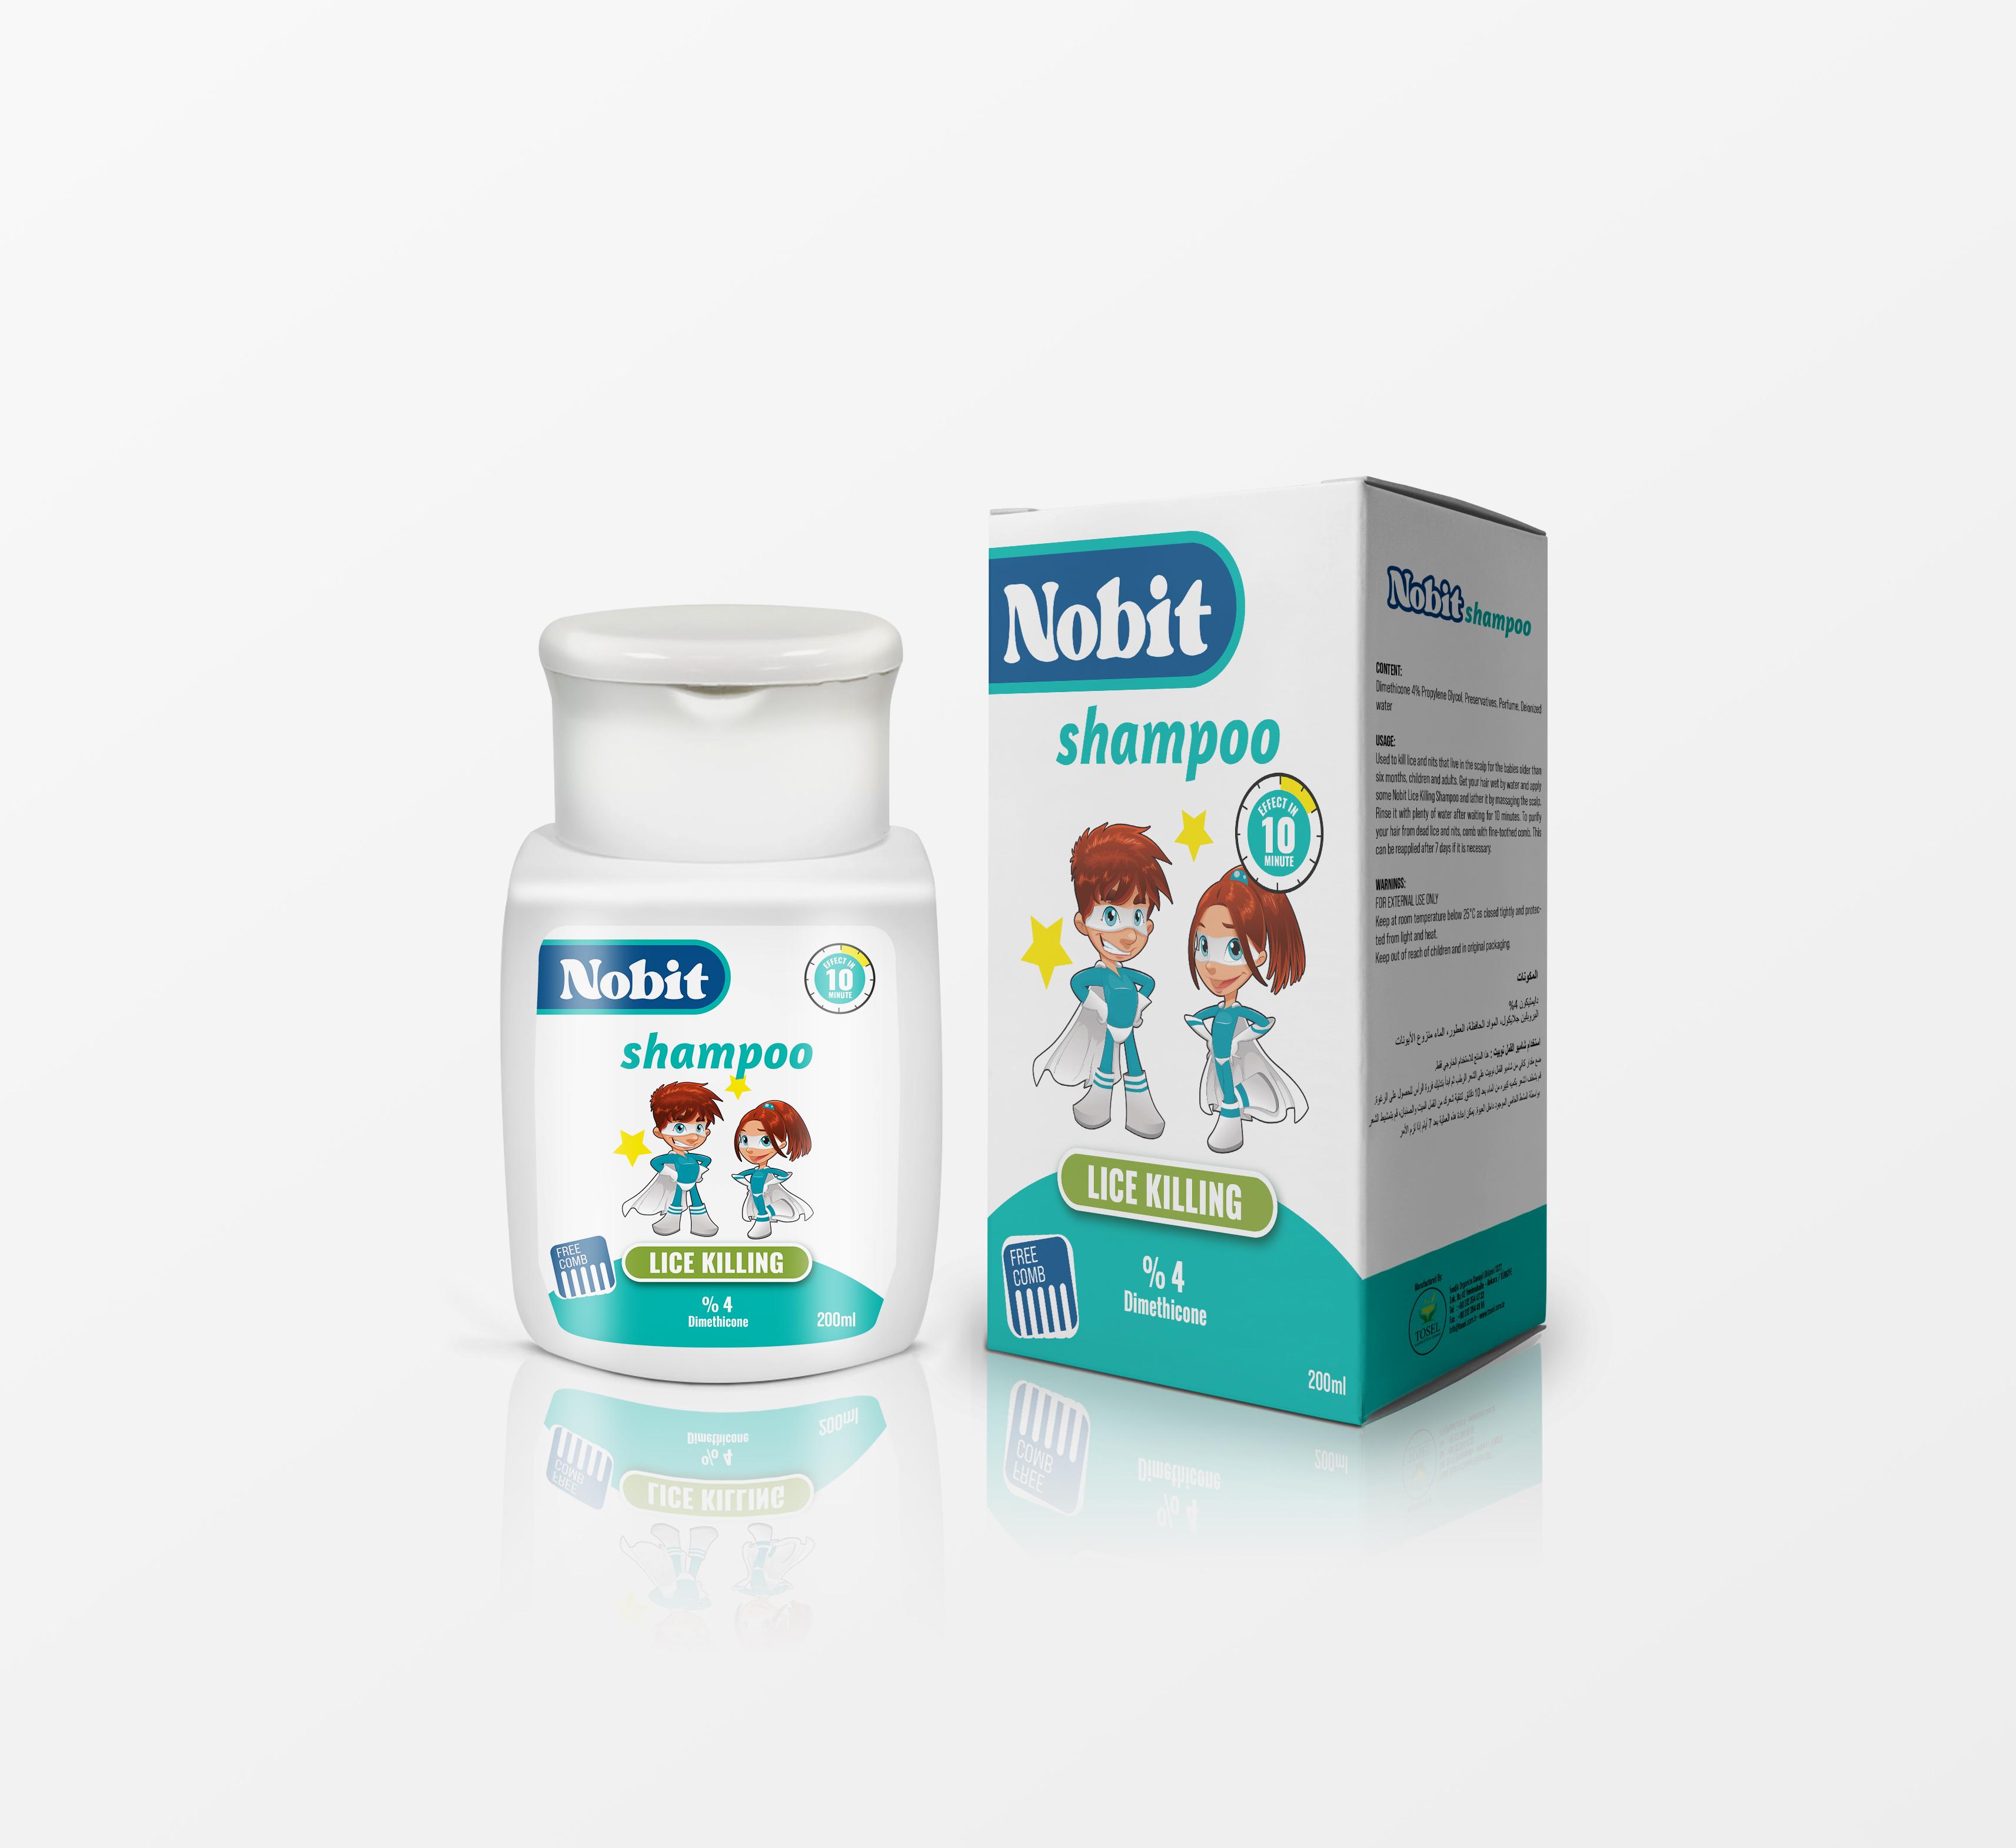 Nobit_shampoo